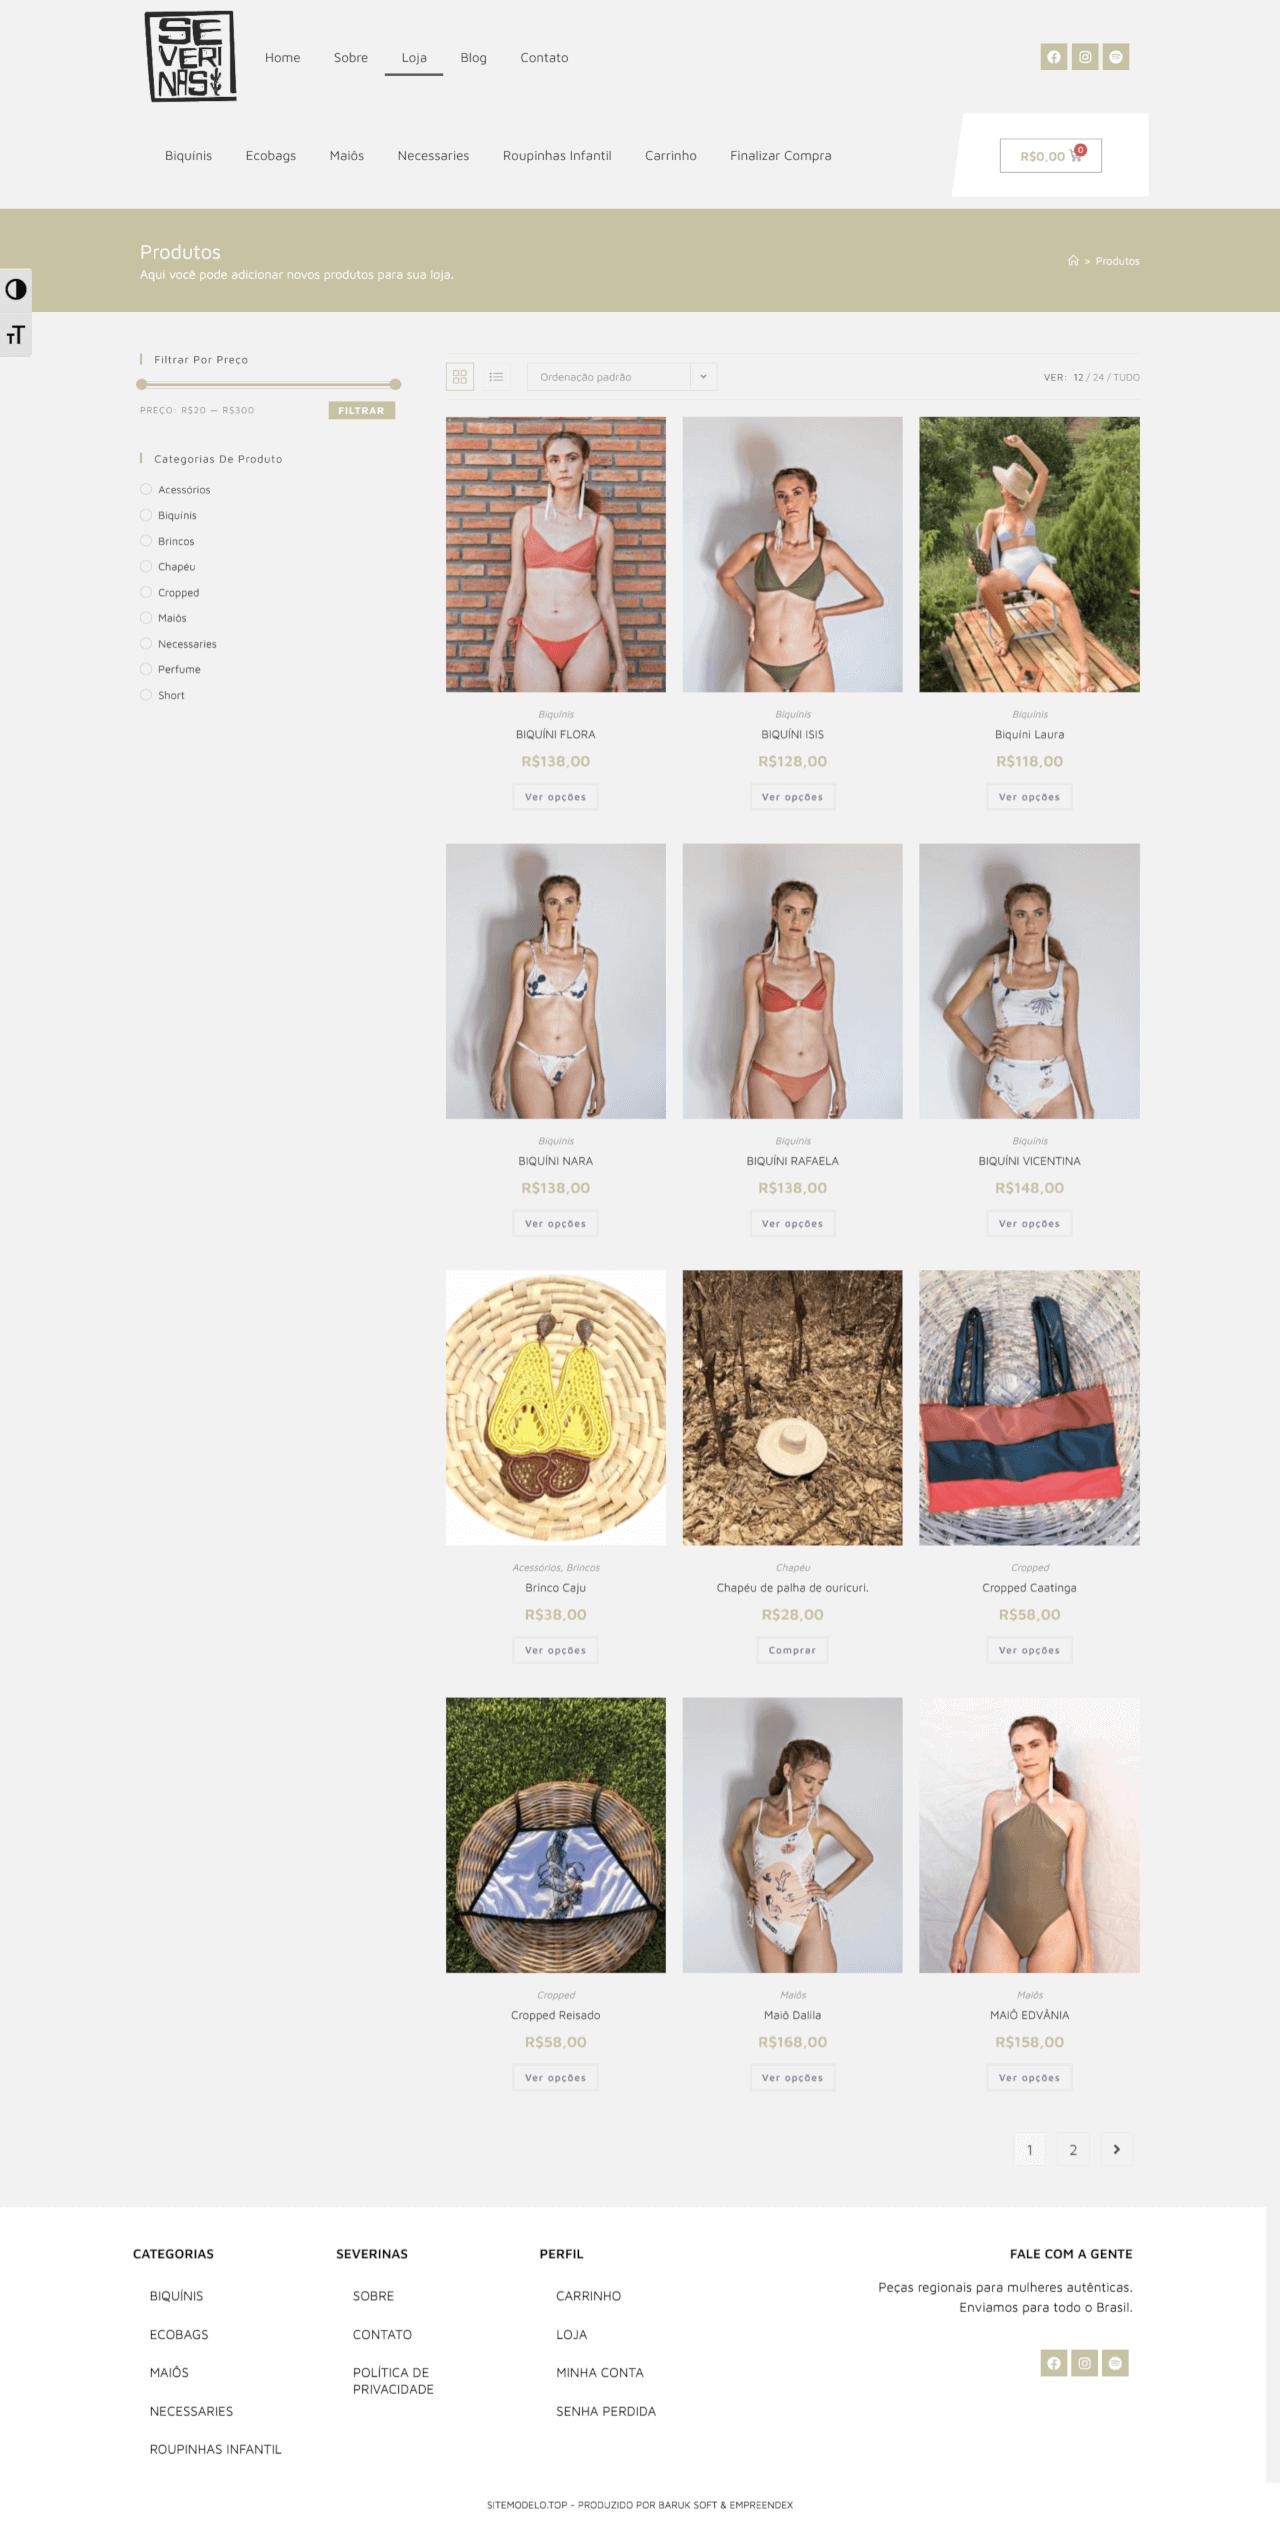 loja virtual moda praia feminina-masculina acessorios roupas aracaju/sergipe - página listagem dos produtos - severinas